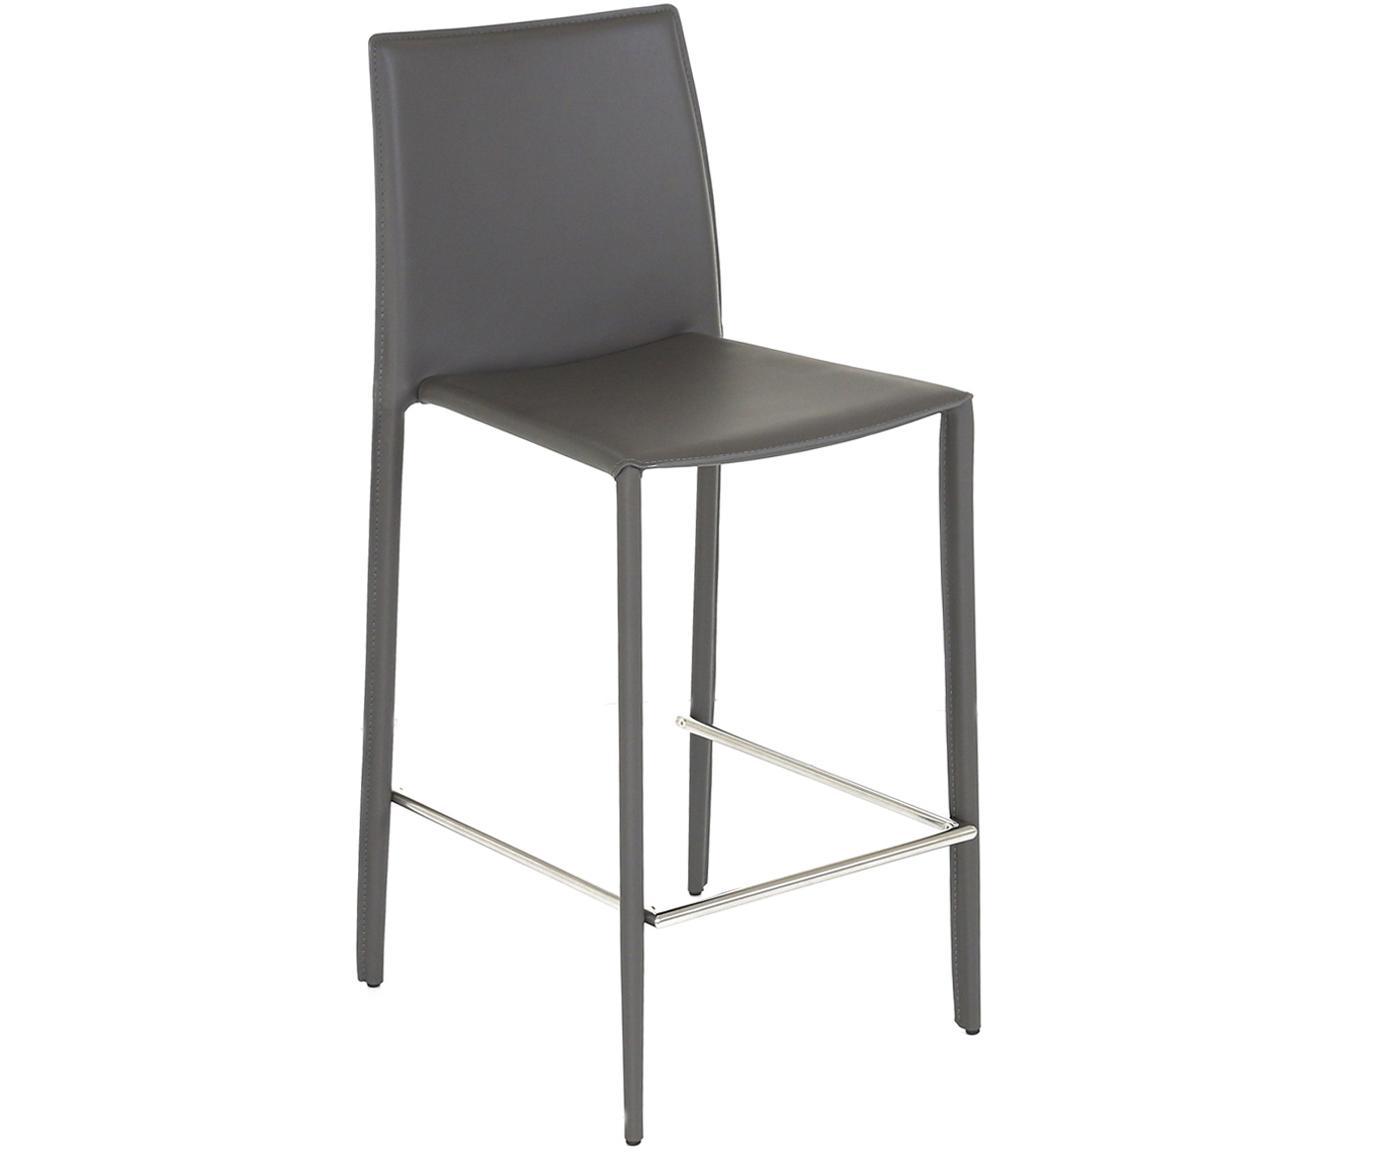 Leder-Thekenstühle Boréalys, 2Stück, Sitzfläche: Recyceltes Leder, Gestell: Metall, pulverbeschichtet, Grau, 44 x 98 cm